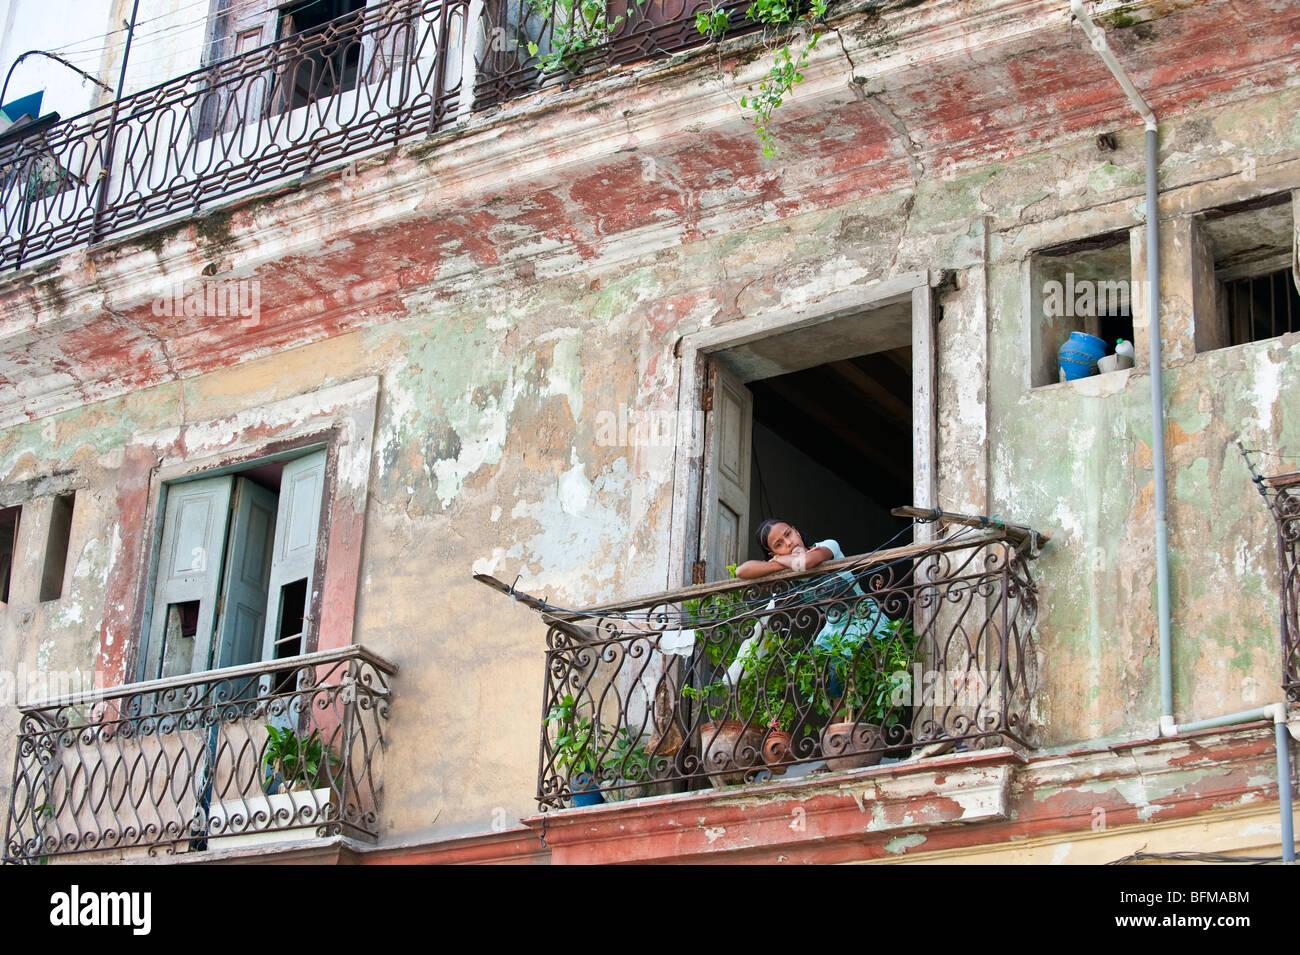 Joven miradas desde un balcón en La Habana, Cuba Imagen De Stock